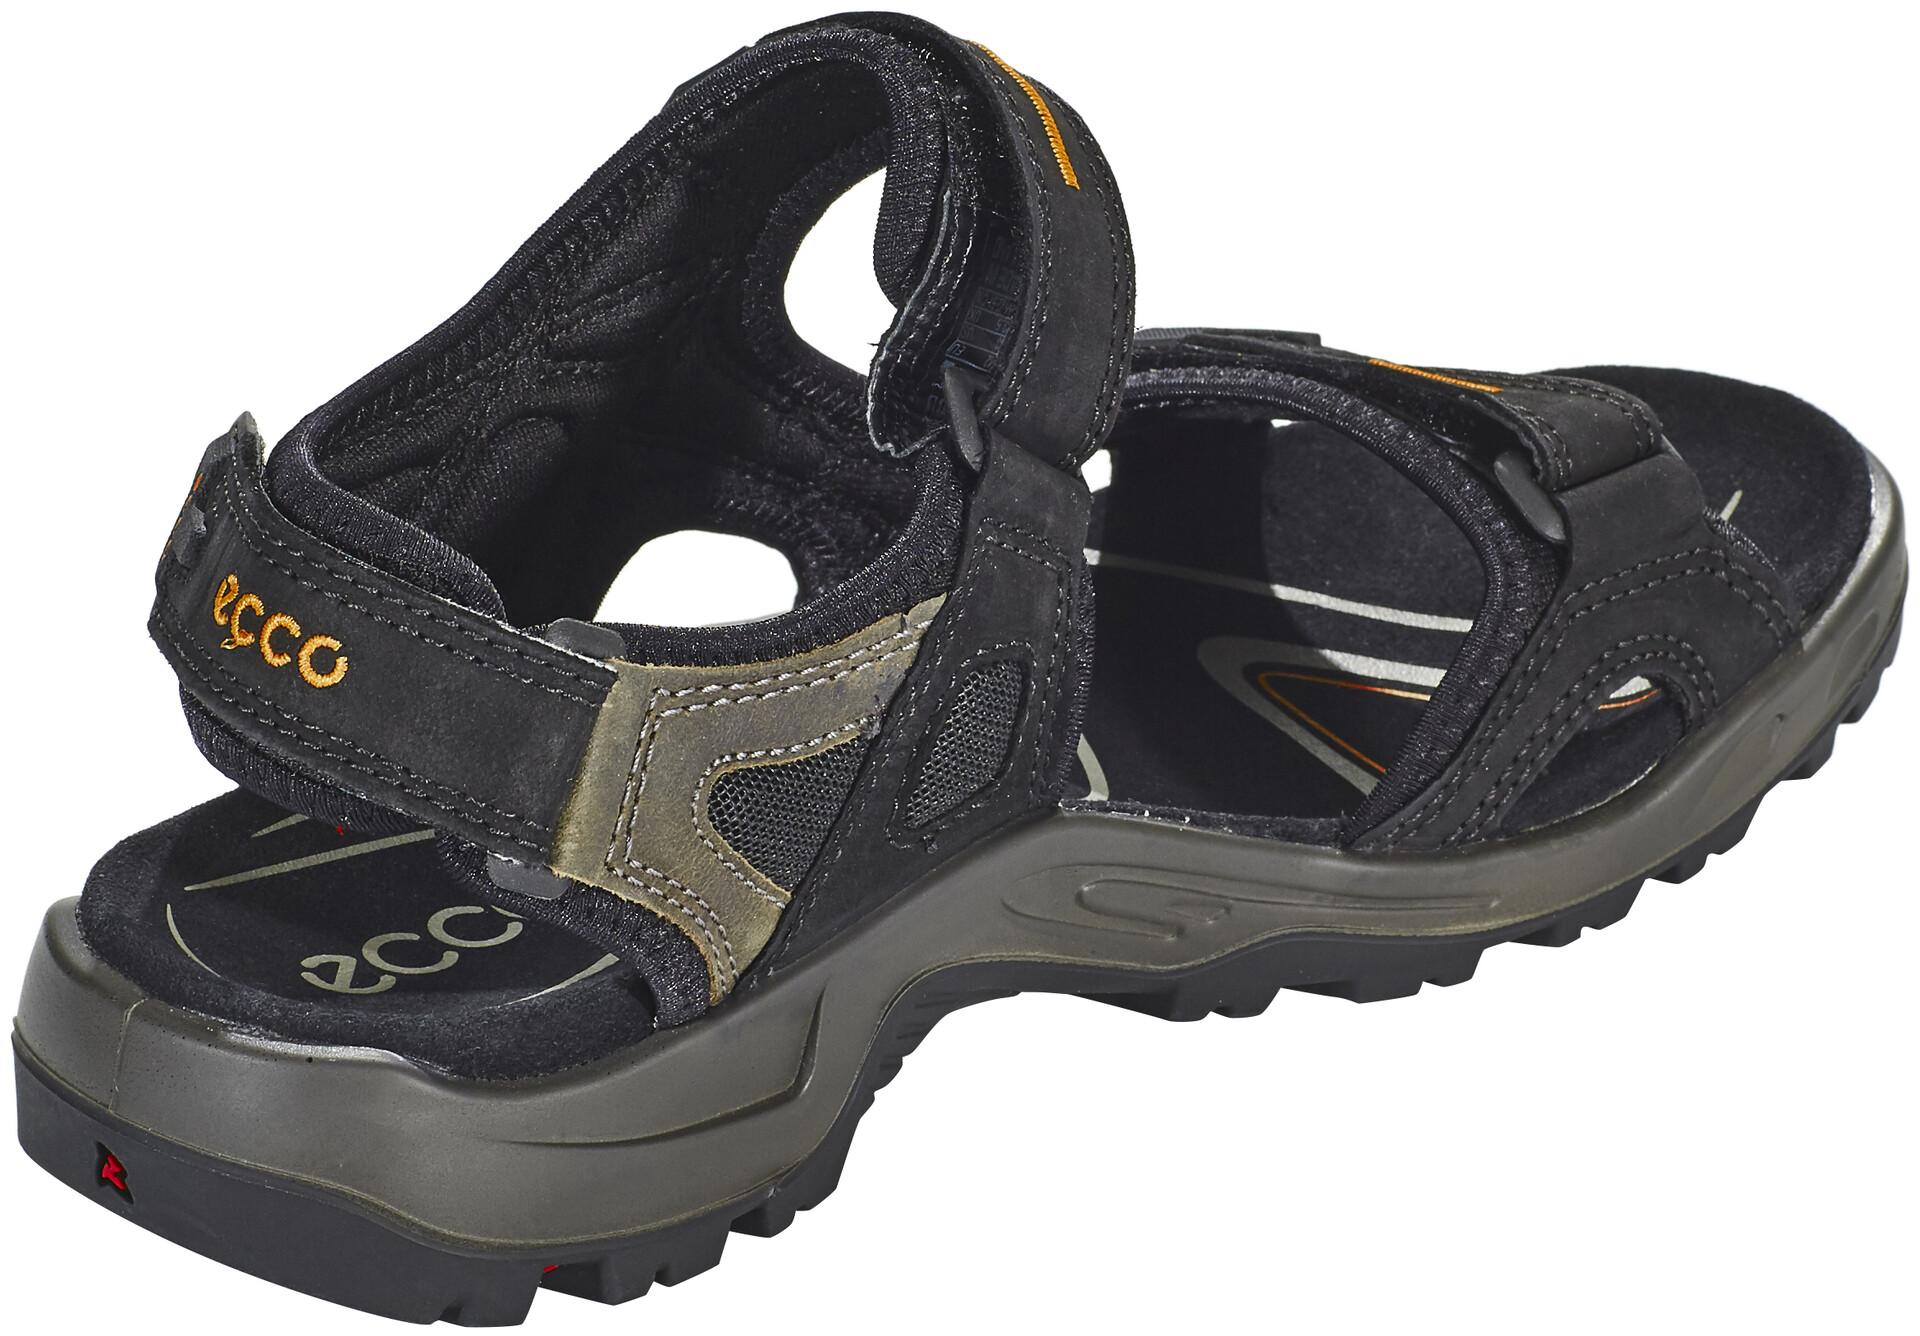 ECCO Sandals   Womens ECCO Flash Casual Sandal marine ECCO Shoes, Sandals